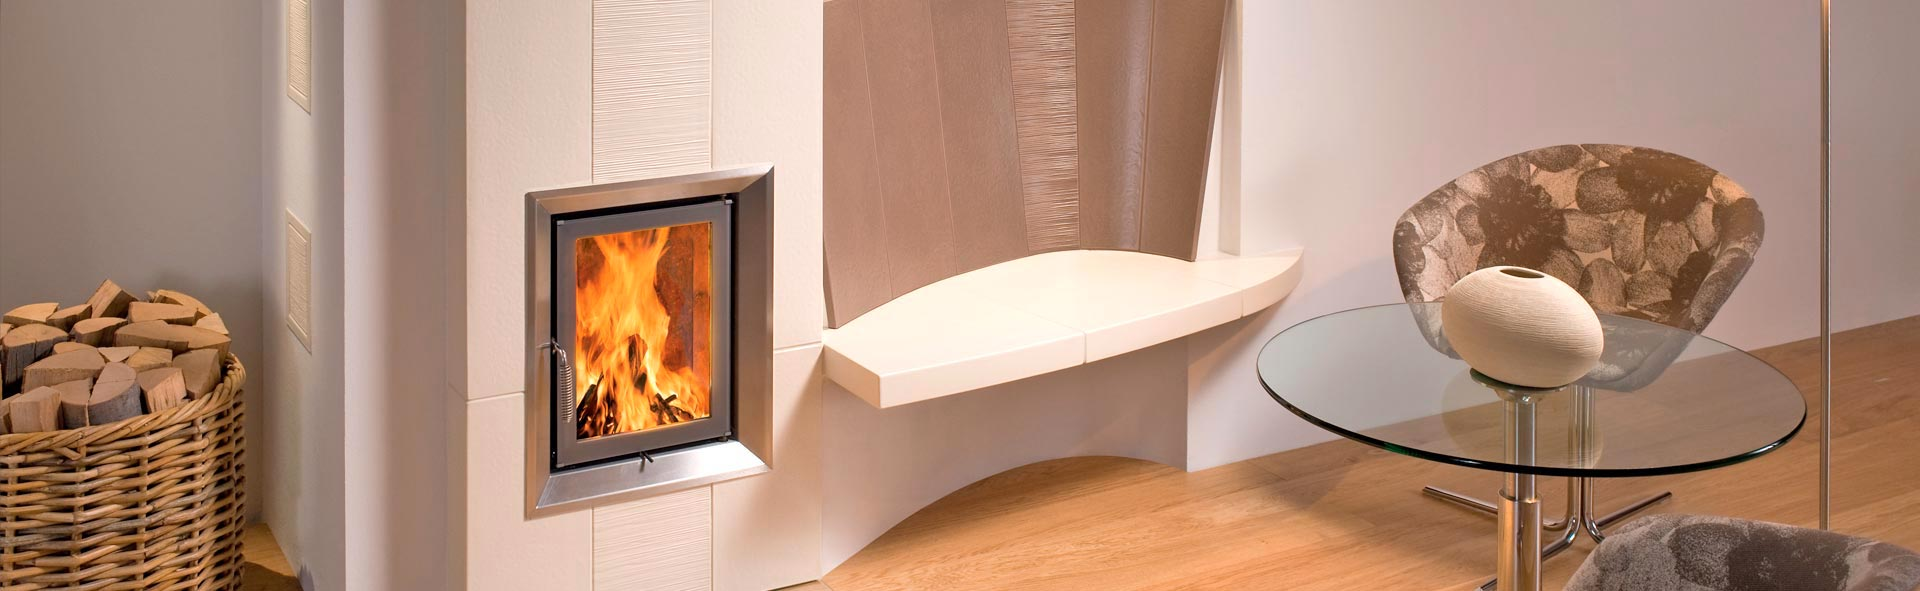 chauffage central sohn chemin es et po les fa ences. Black Bedroom Furniture Sets. Home Design Ideas